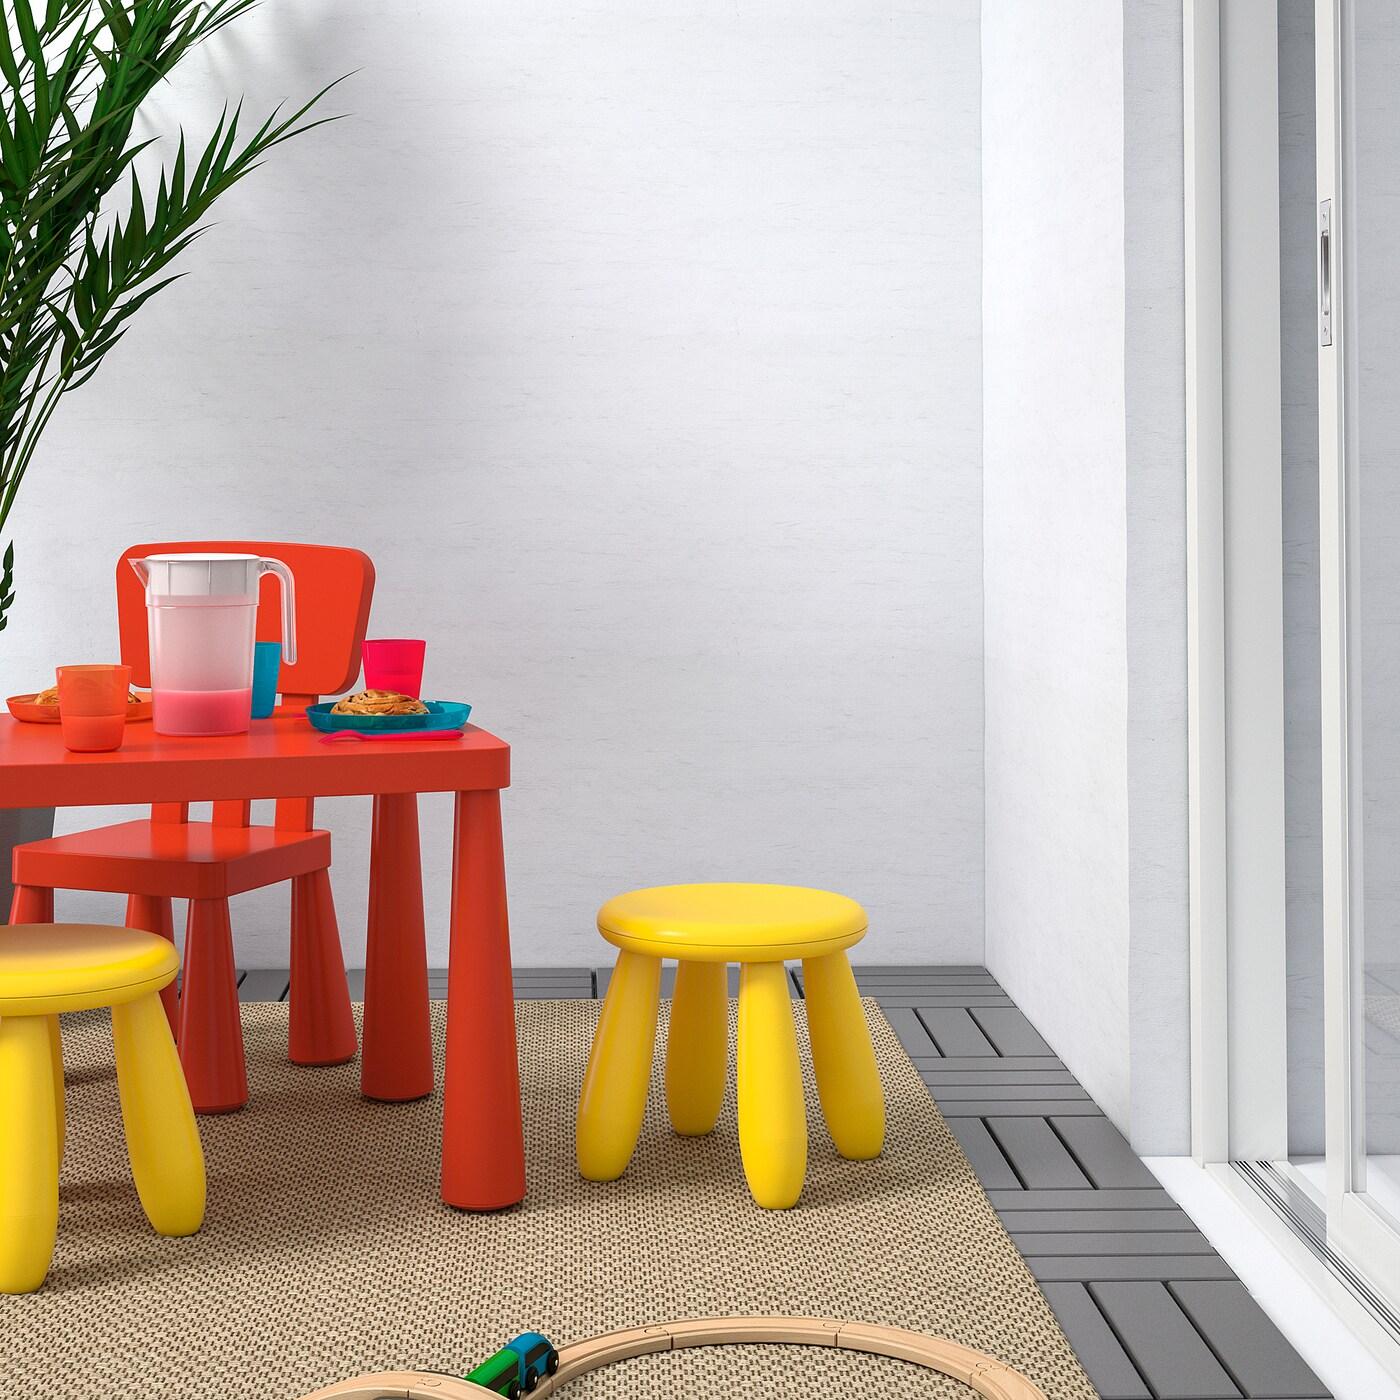 MAMMUT Children's stool, in/outdoor/yellow